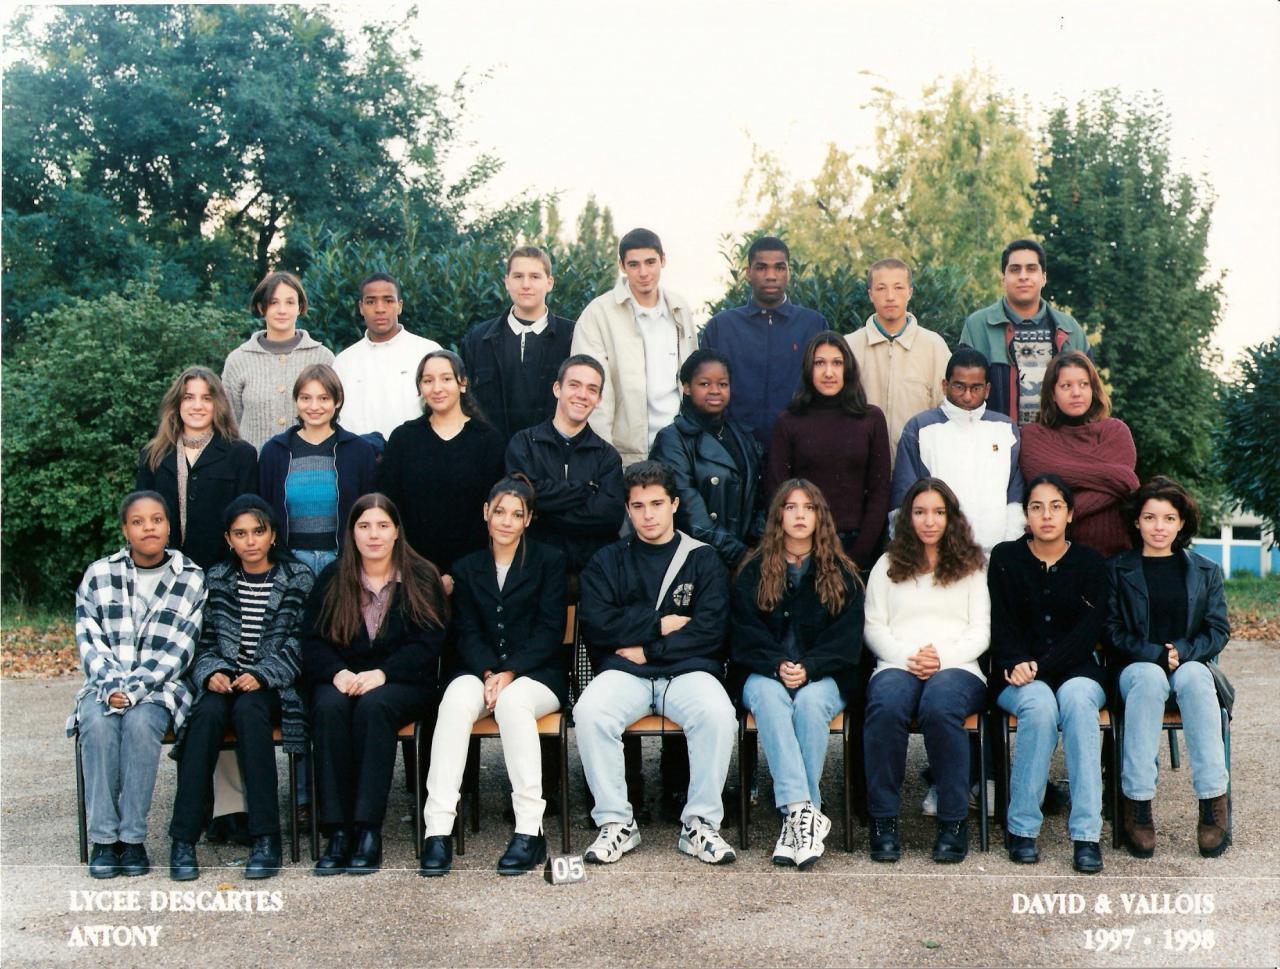 1998 - 1STT1 - DAVID